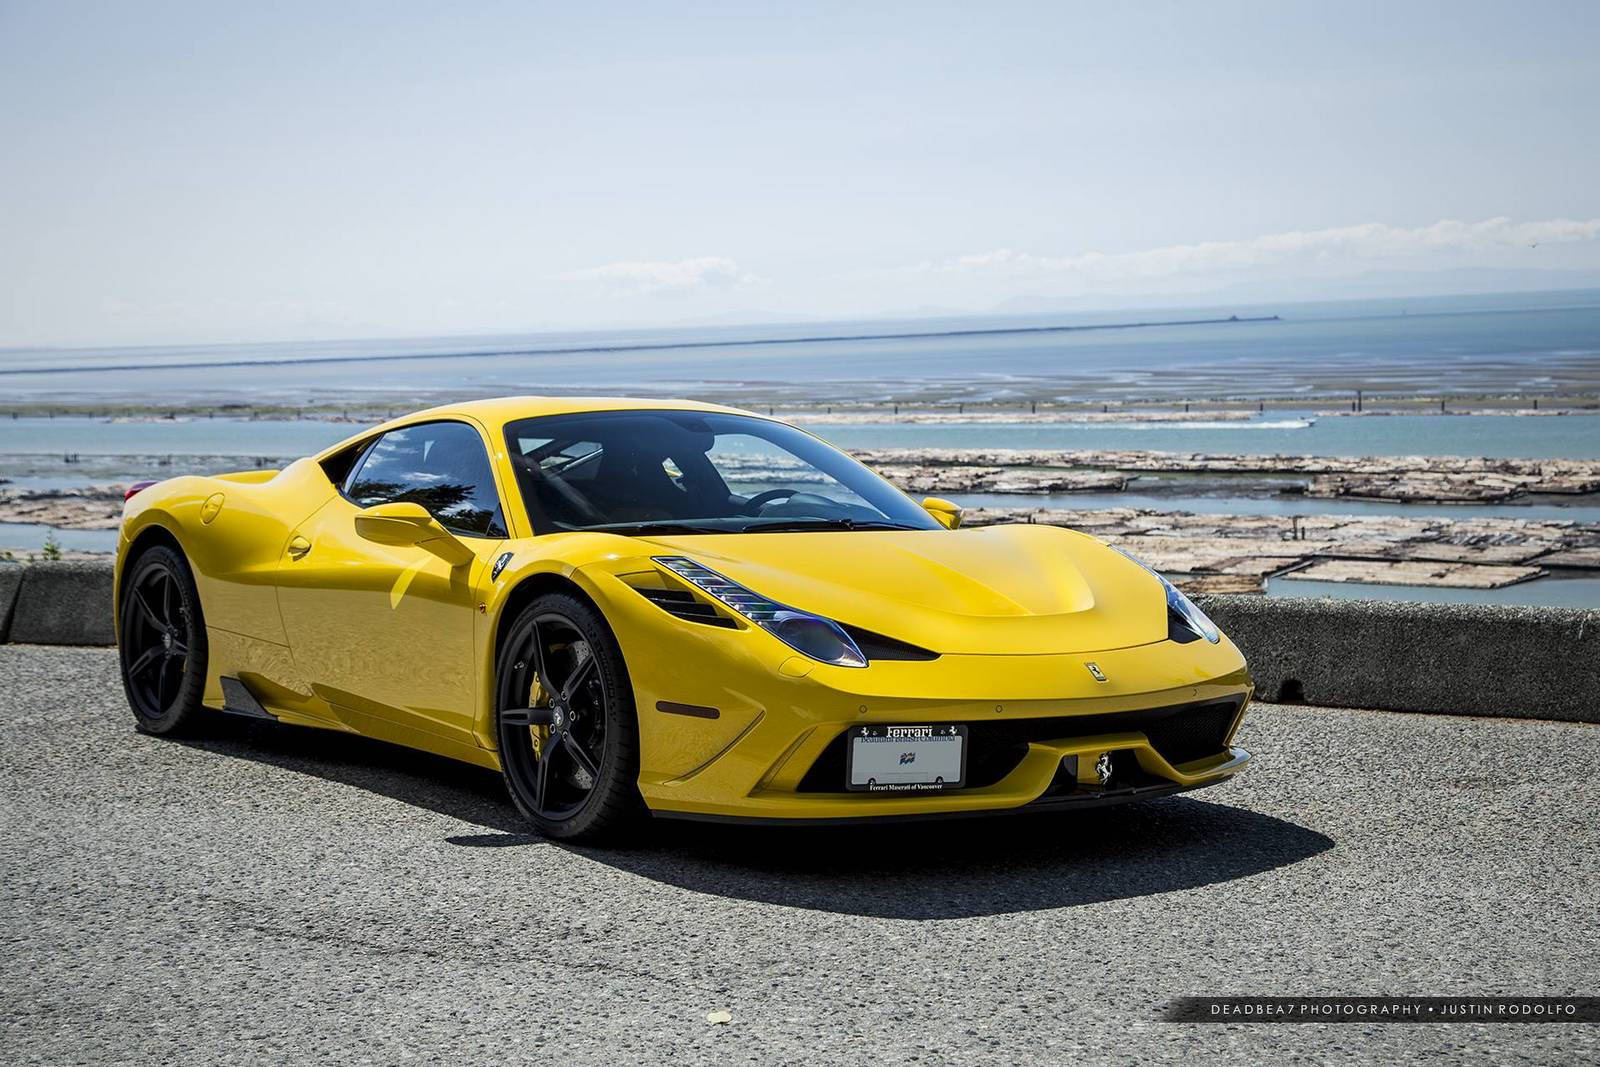 Ferrari 458 Italia Yellow Yellow Ferrari 458 Italia With Adv 1 Wheels Gtspirit Italia Yellow